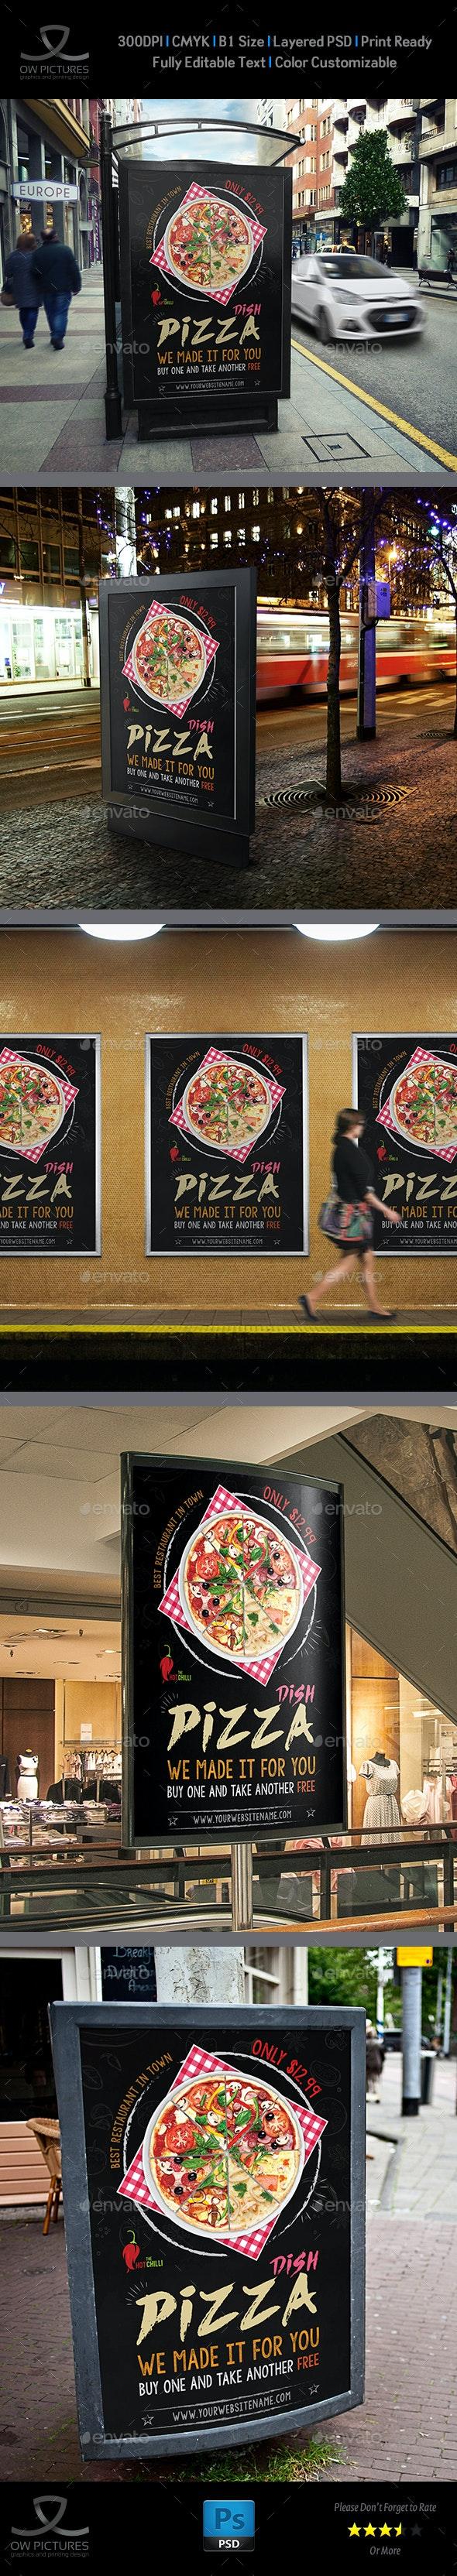 Pizza Restaurant Poster Template Vol.3 - Signage Print Templates